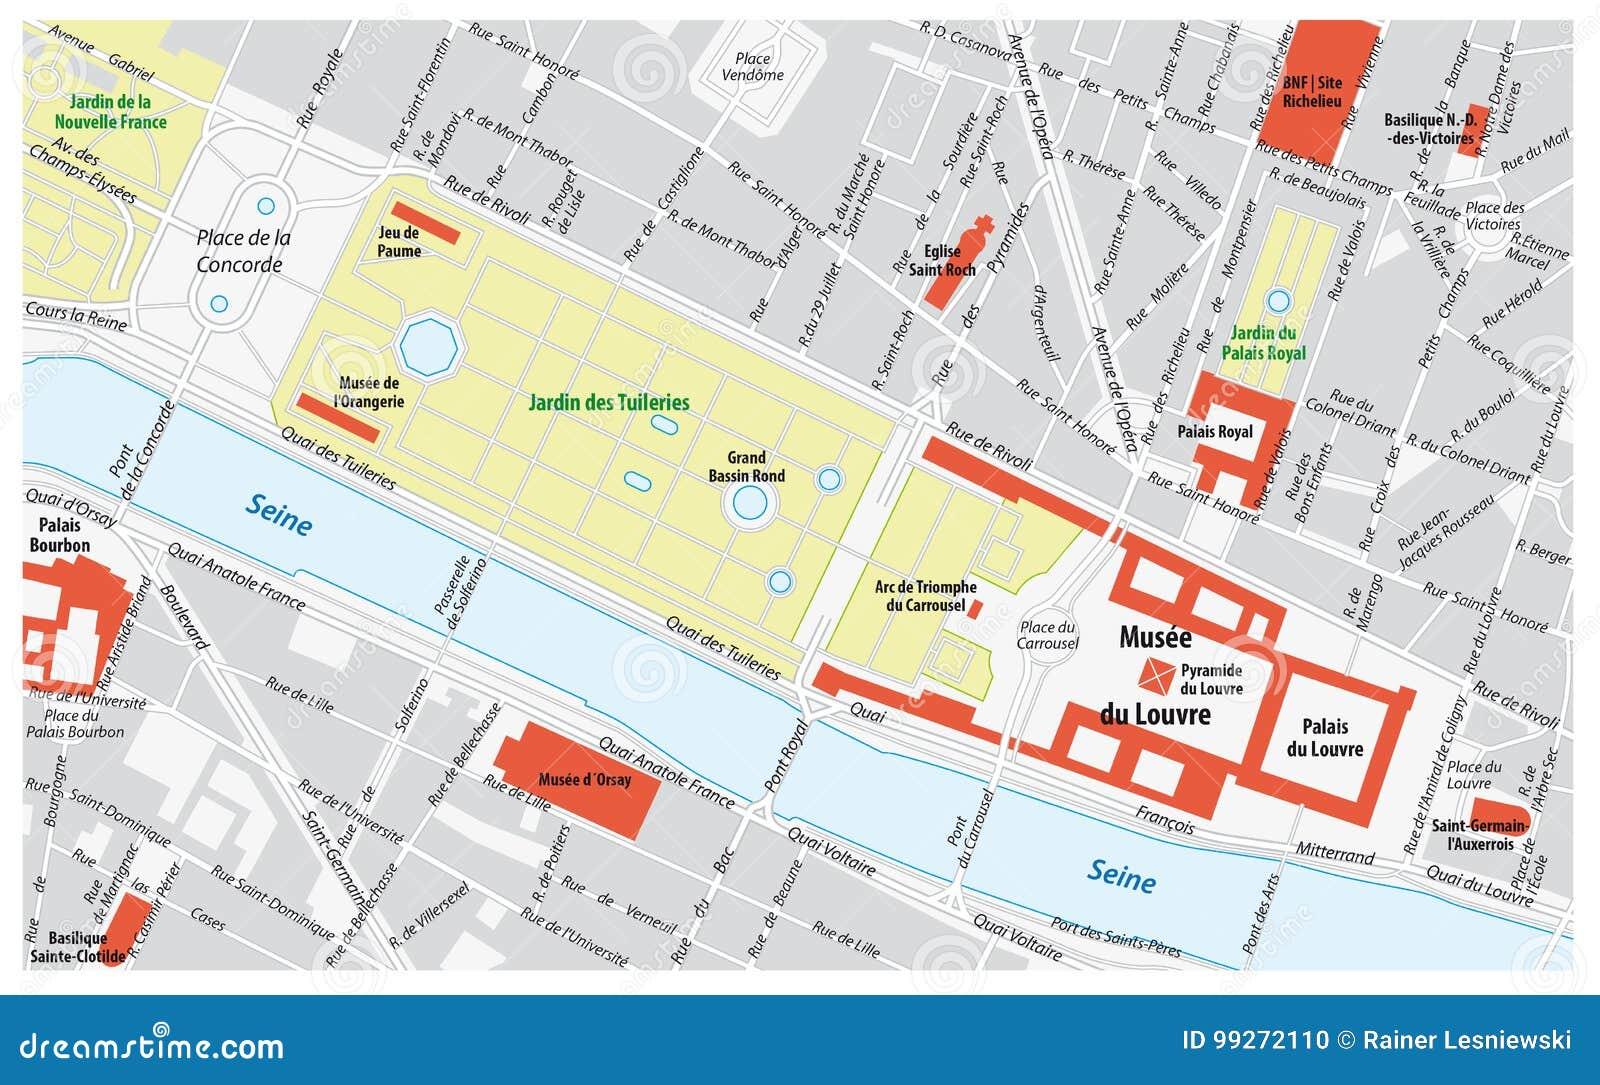 Cartina Di Parigi E Dintorni.Mappa Di Dintorni Del Museo Del Louvre A Parigi Francia Illustrazione Vettoriale Illustrazione Di Parigi Profilo 99272110